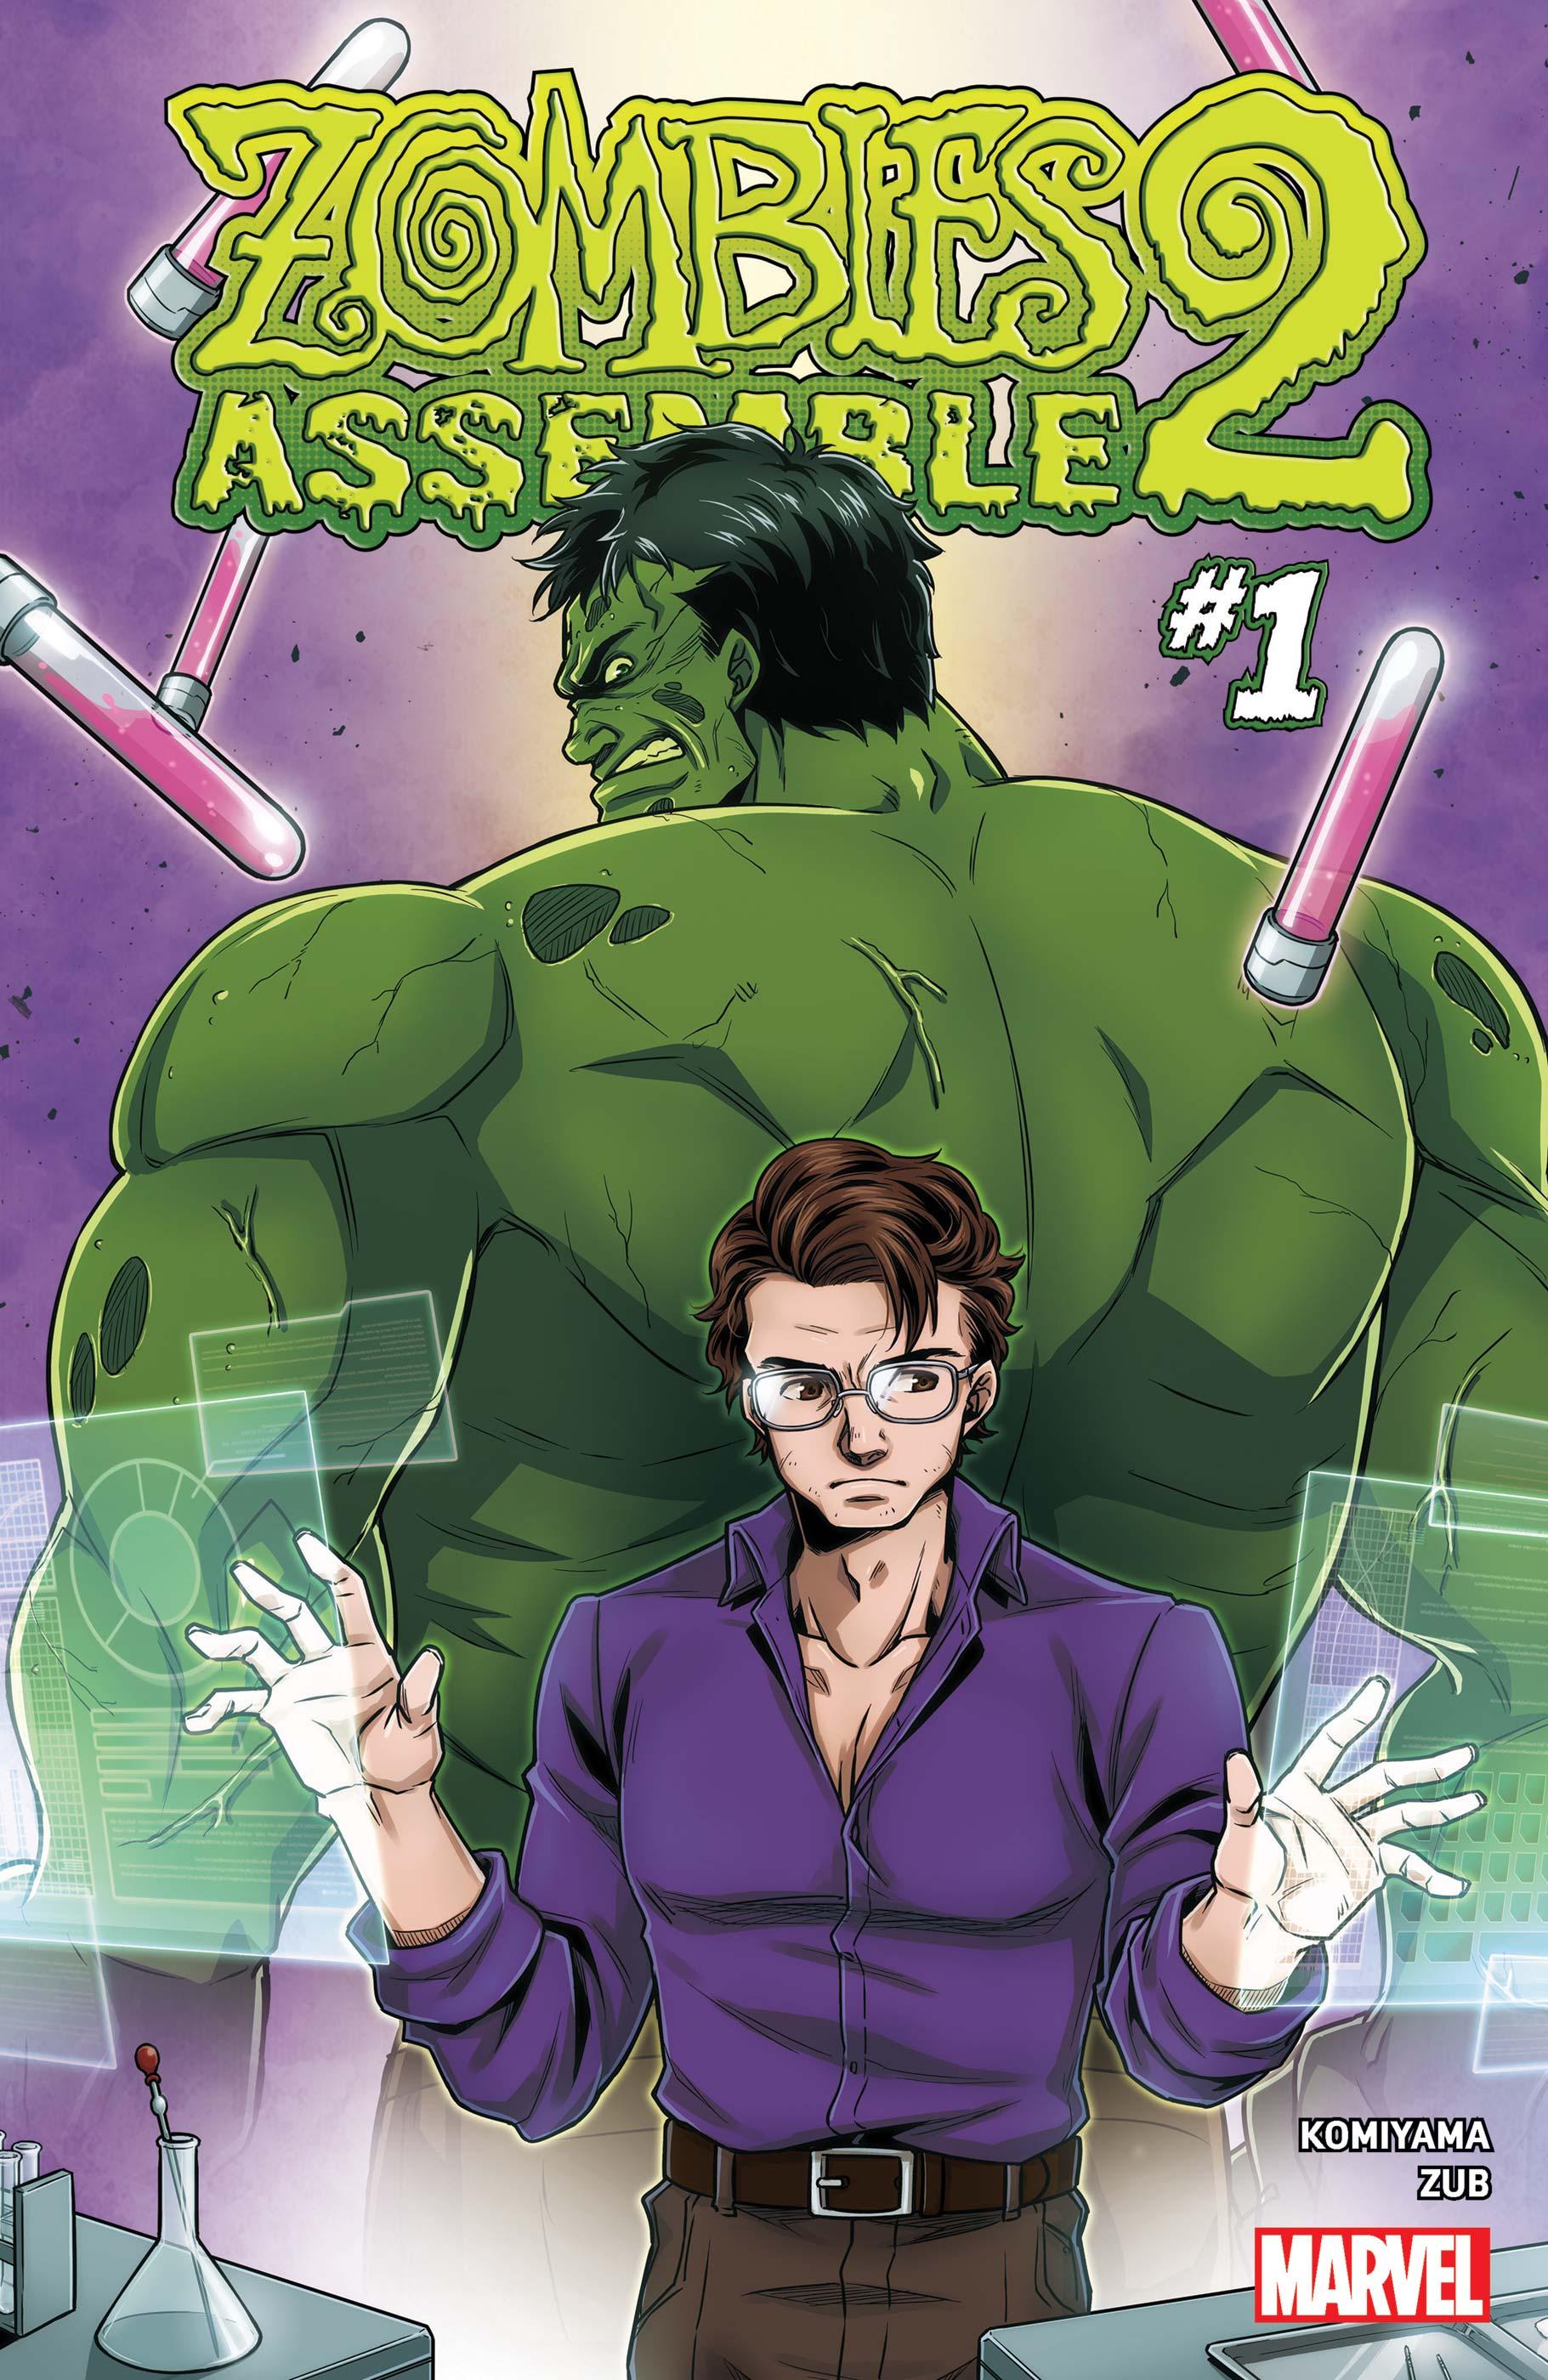 Zombies Assemble 2 (2017) #1